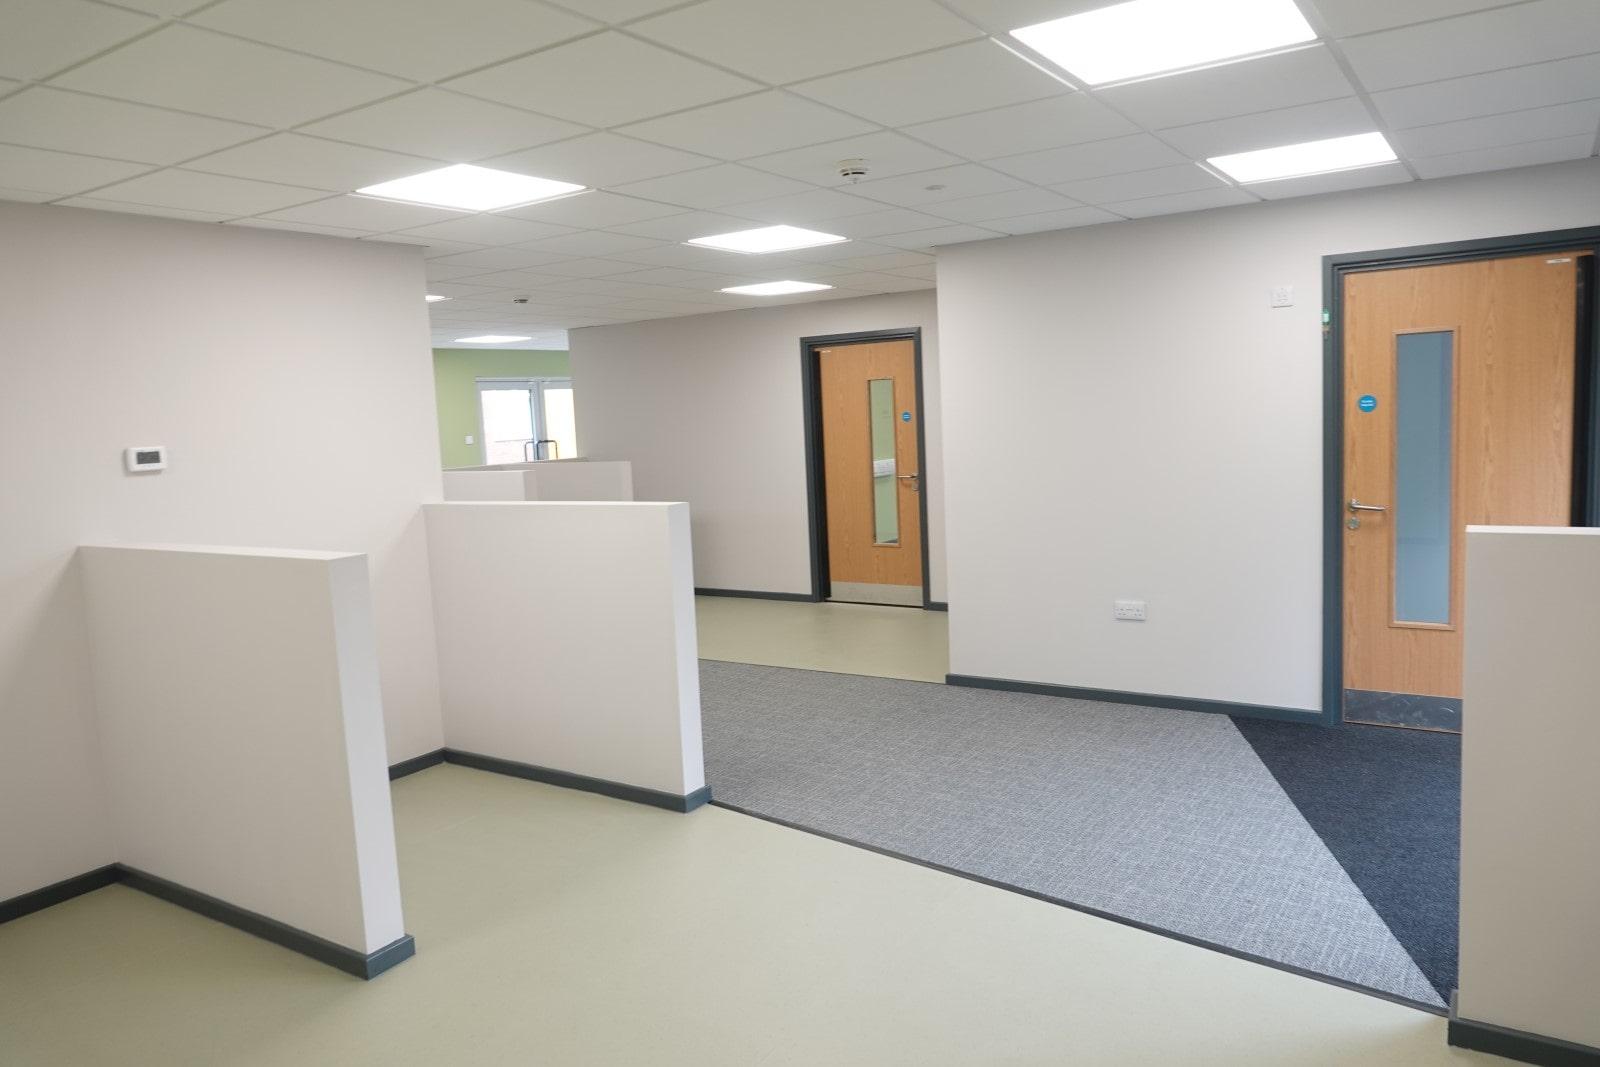 Inside The Garth School Modular Classroom Building